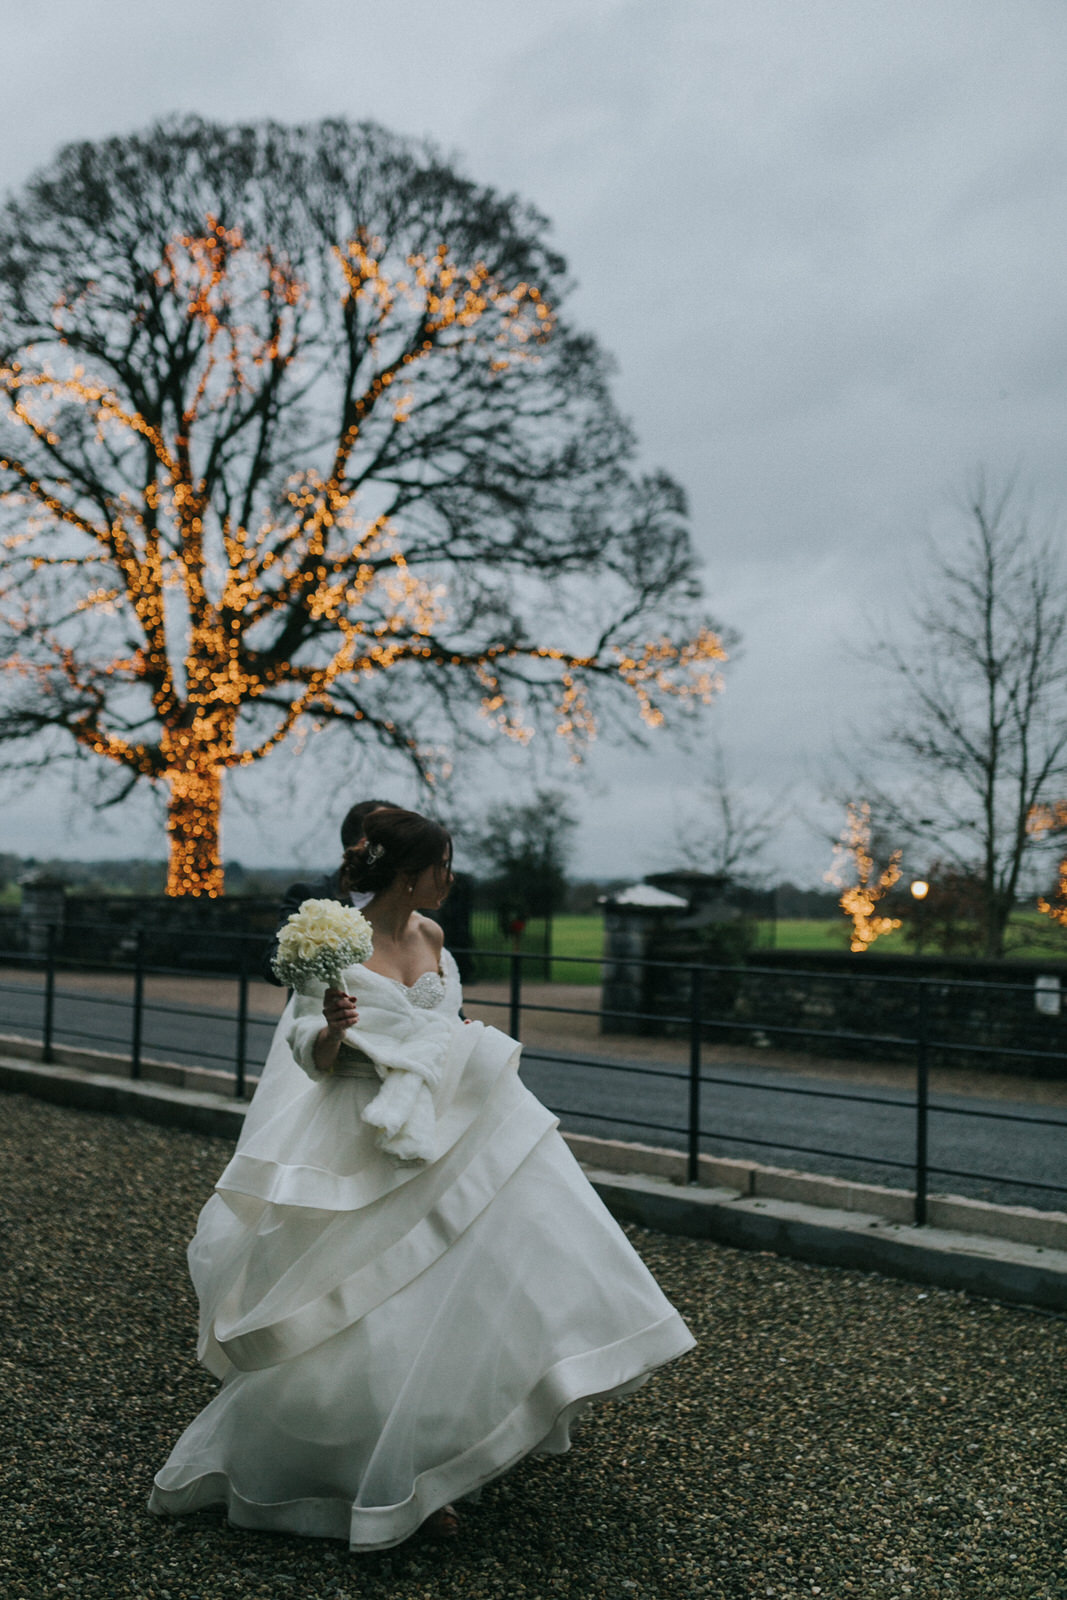 Clonabreany_wedding-photographer_roger_kenny_ireland_078.jpg